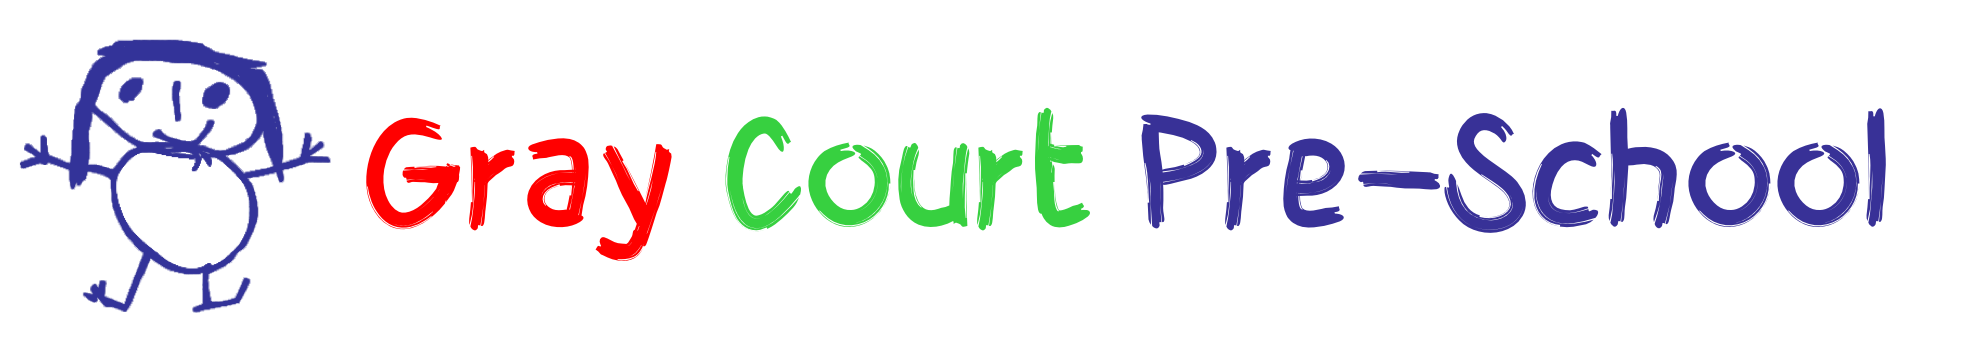 Gray Court Pre-School